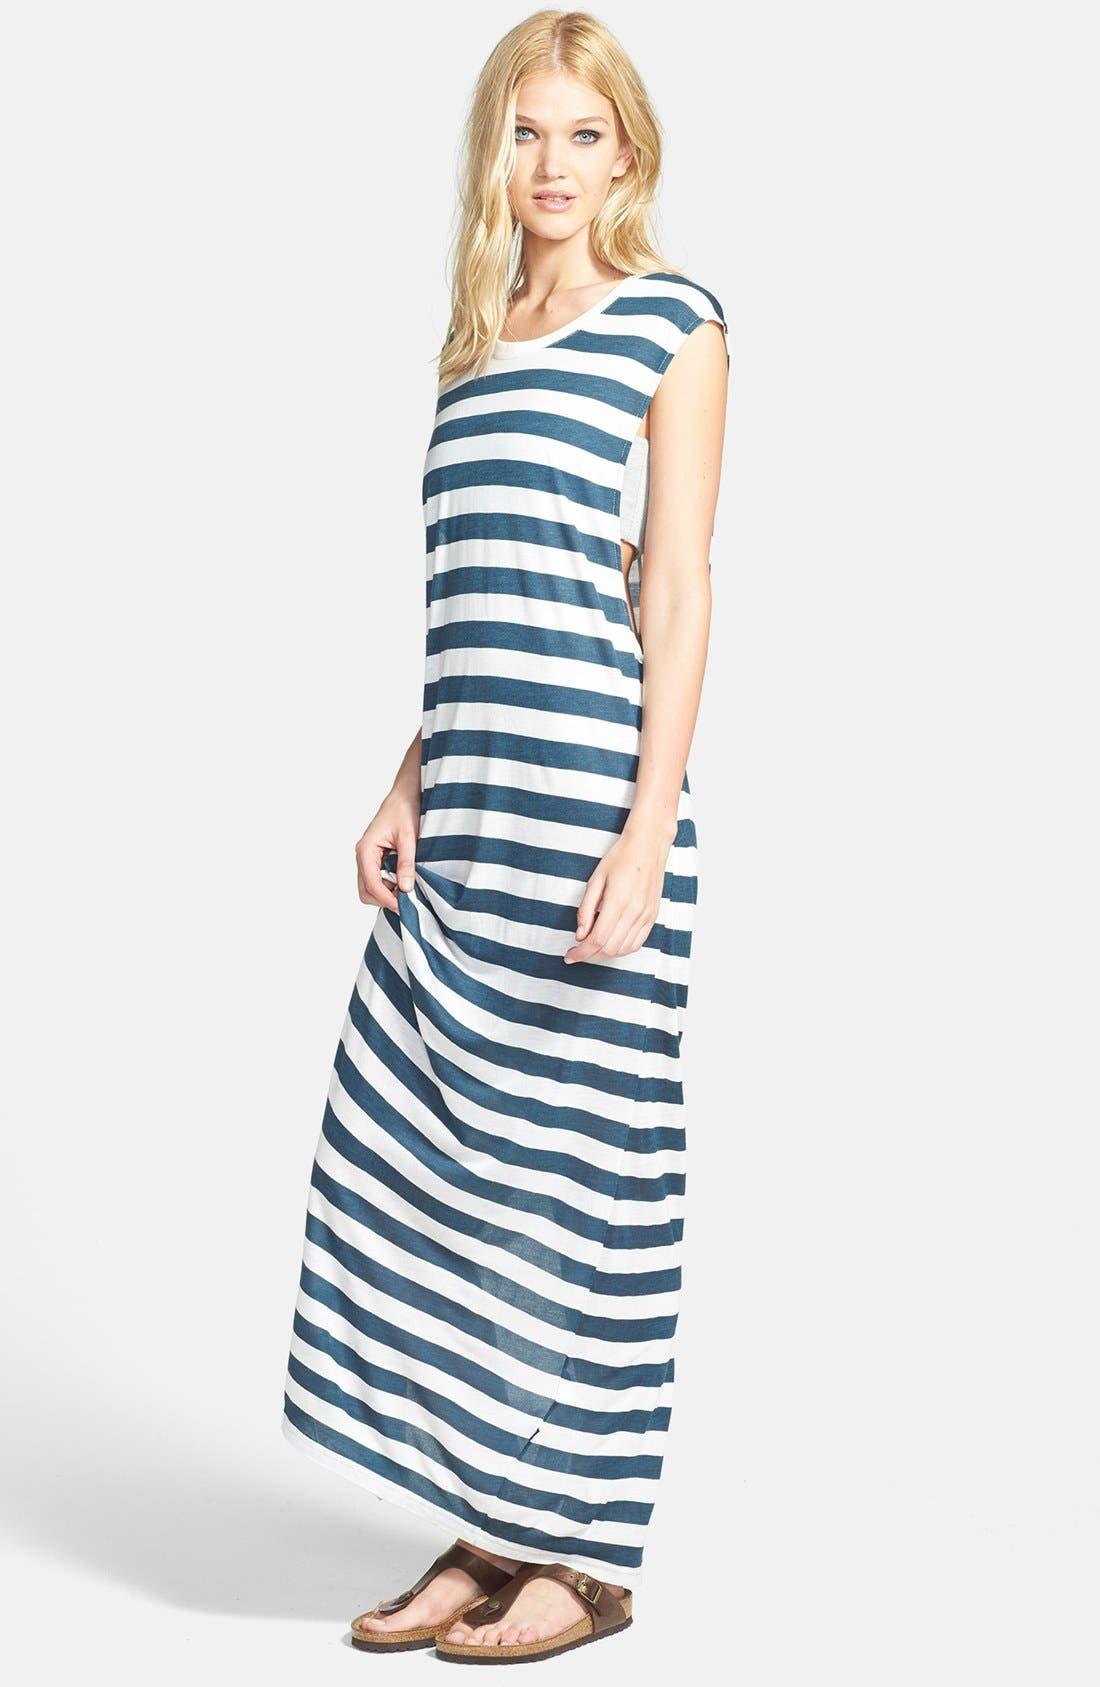 Alternate Image 1 Selected - MINKPINK 'Wild Wild Life' Stripe Jersey Maxi Dress